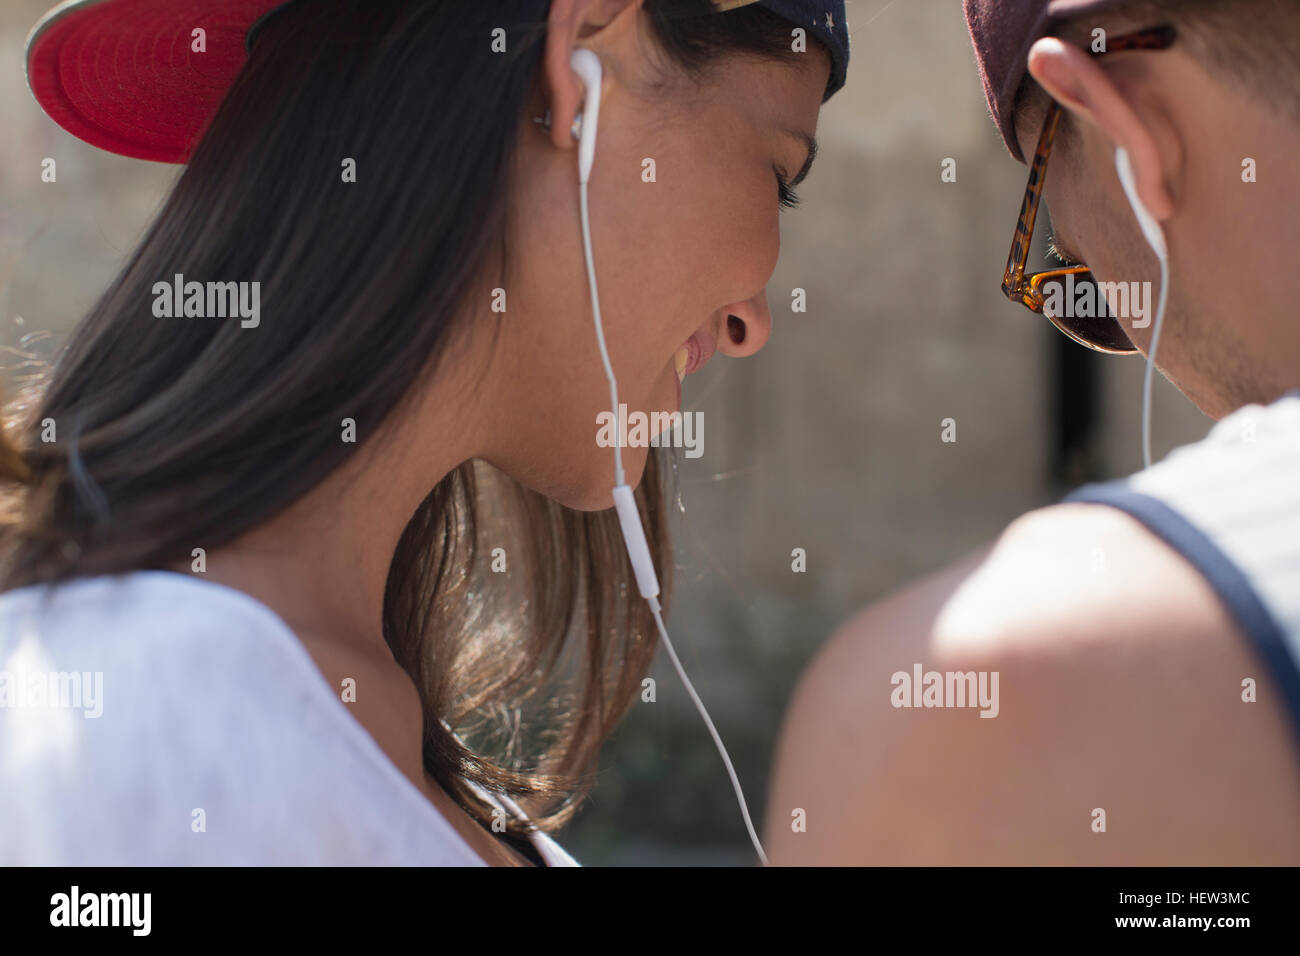 Couple wearing and sharing earphones - Stock Image